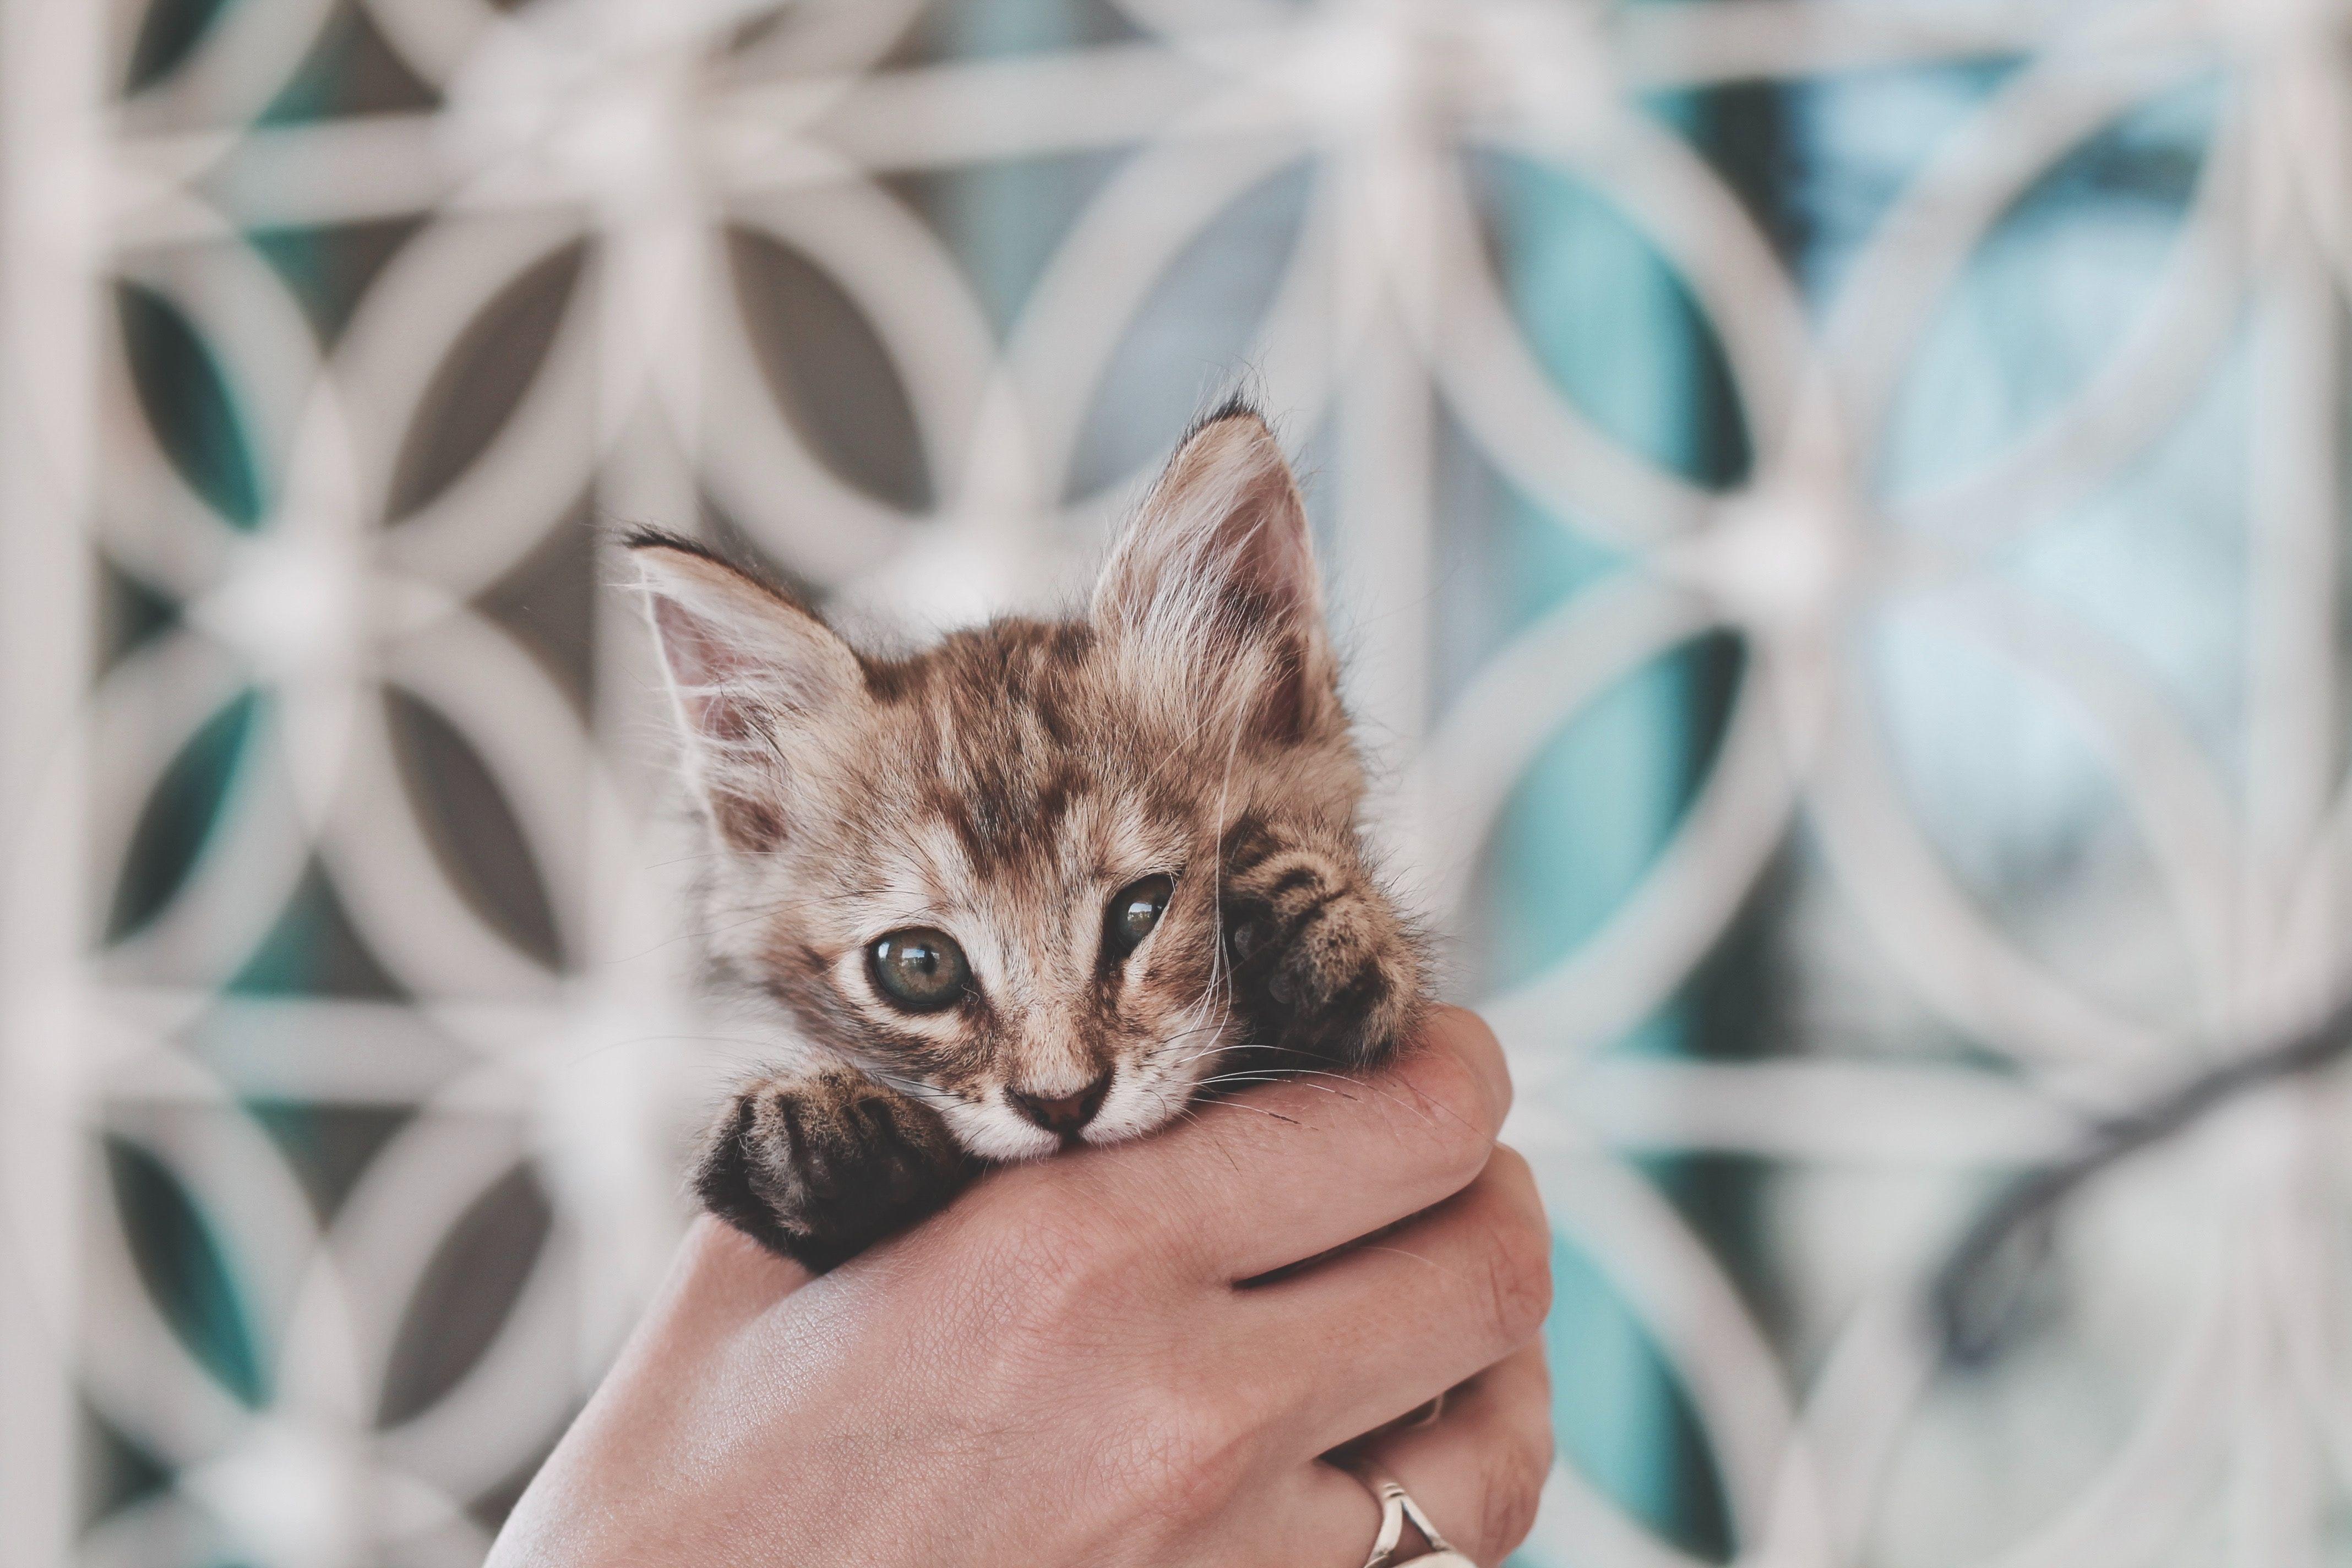 Lol So Fun And Cute Picture Tabby Kitten Cat Dander Grey Tabby Kittens